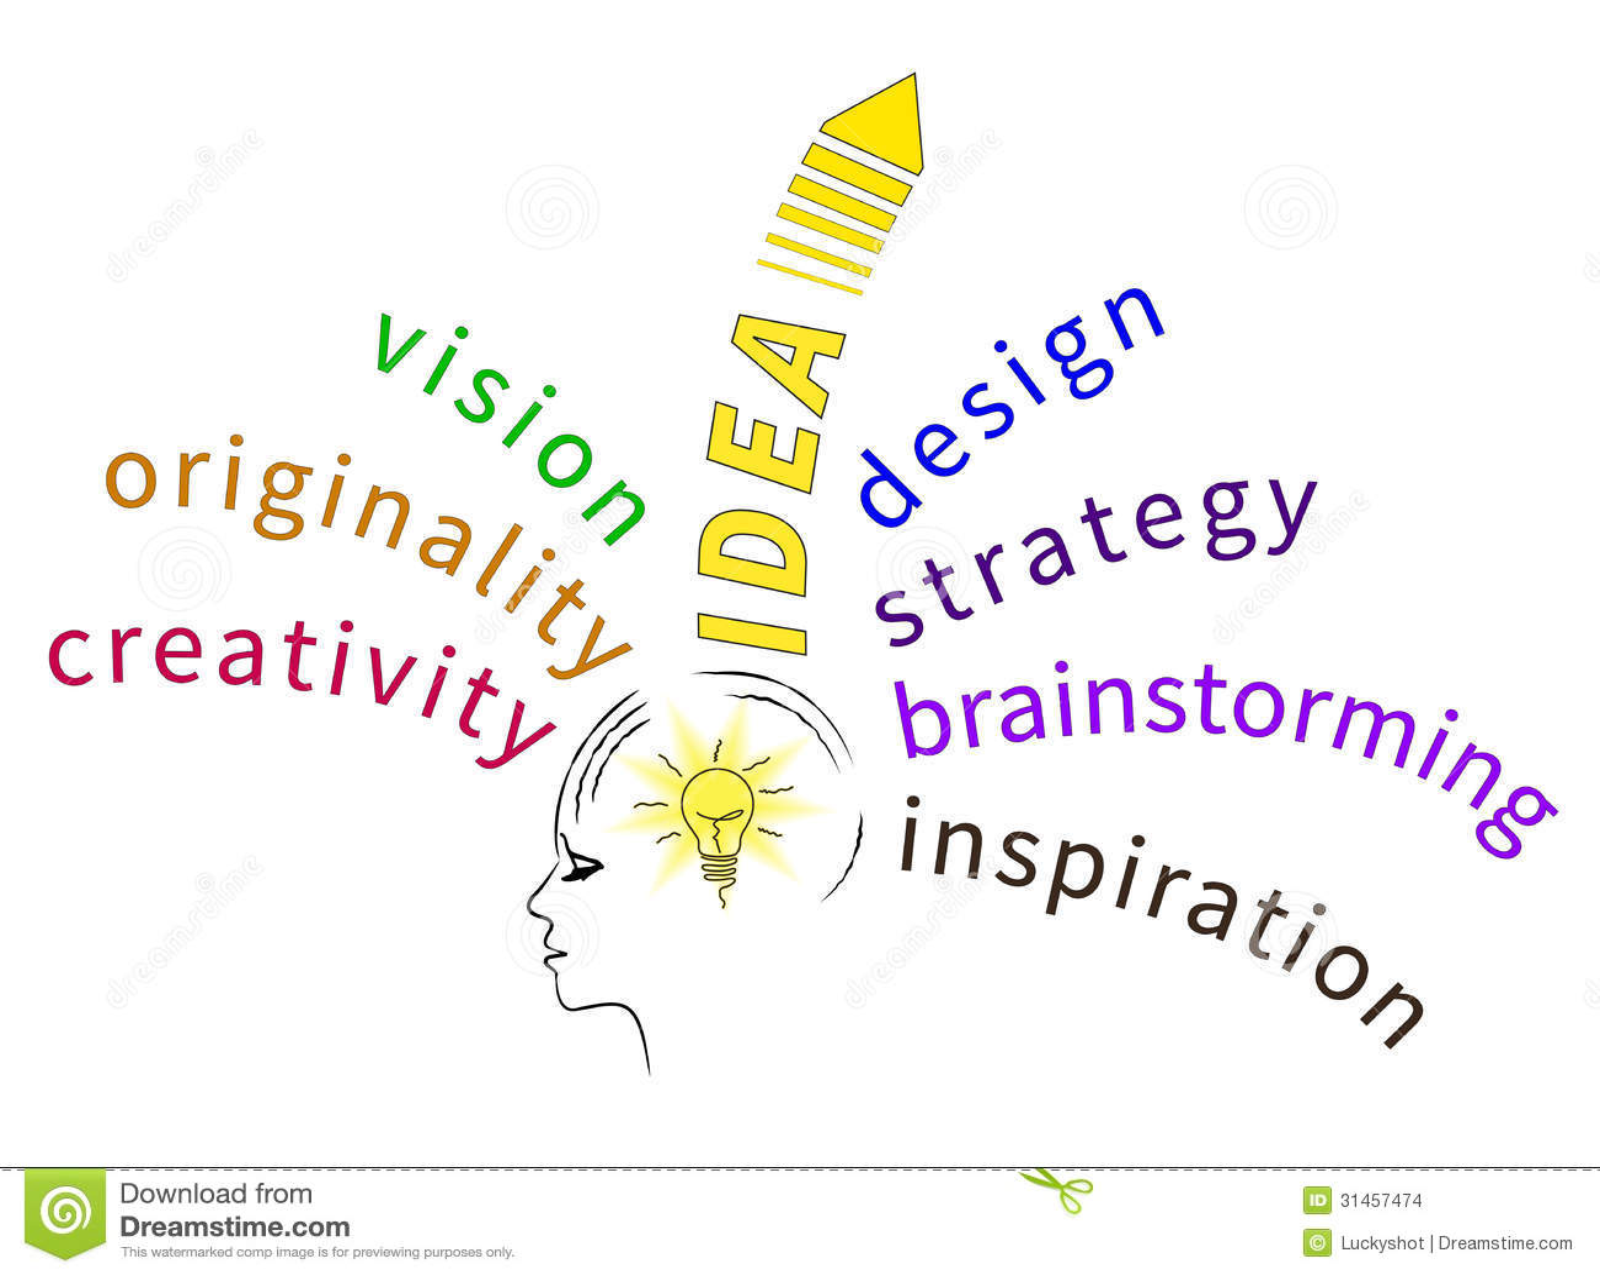 Brainstorming pomysły